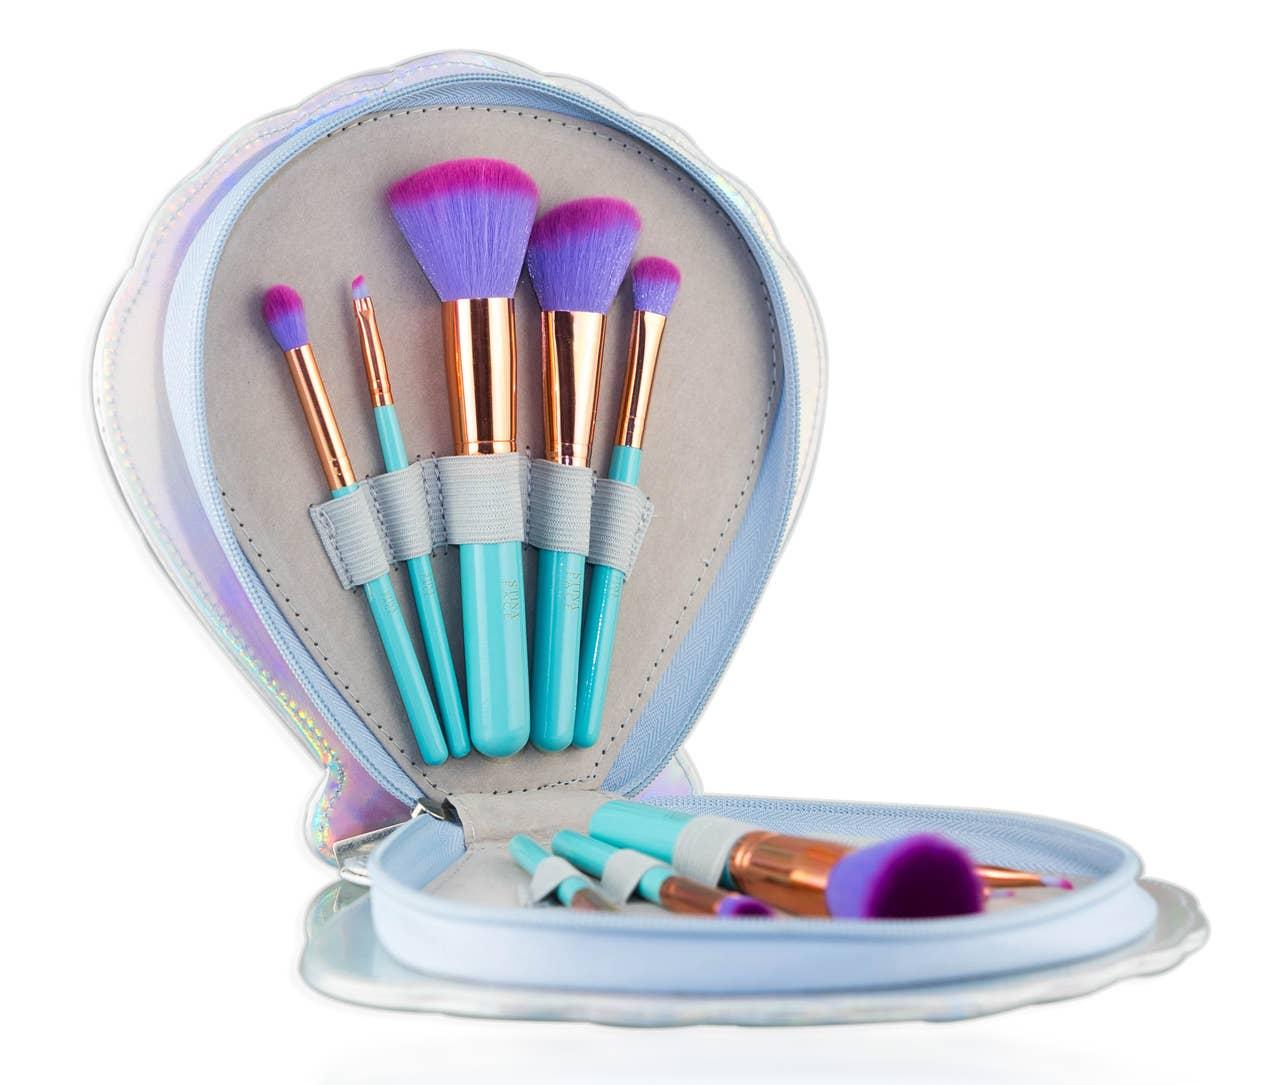 Aqua Brush Set - Stinaface Mermaid Clam Brush Set   Trada Marketplace